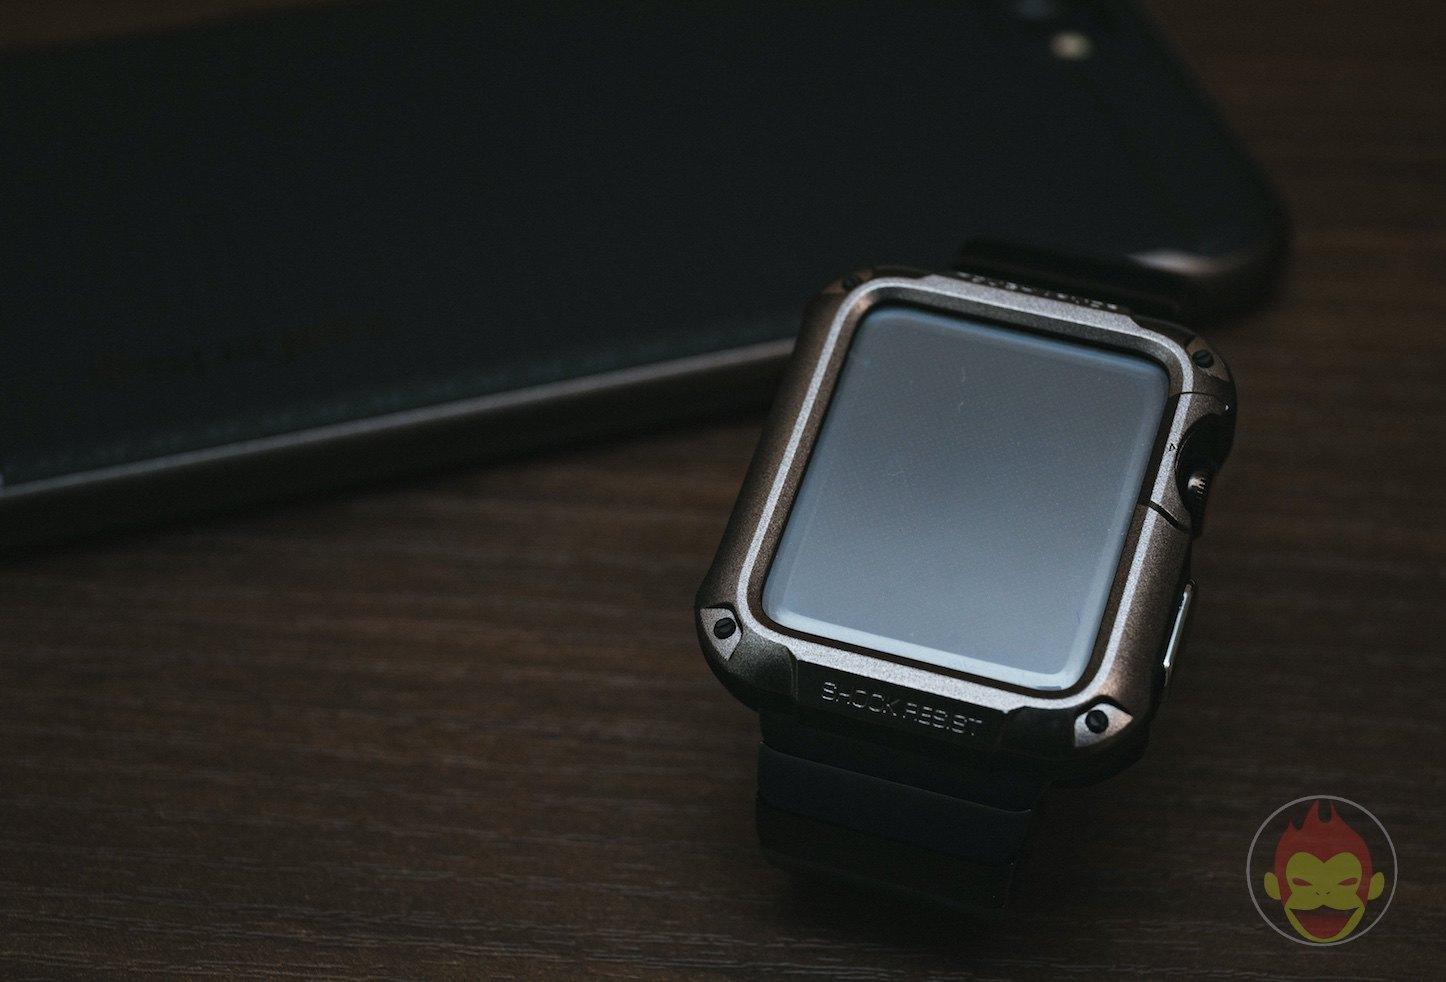 Spigen-Touch-Armor-Apple-Watch-Case-02.jpg